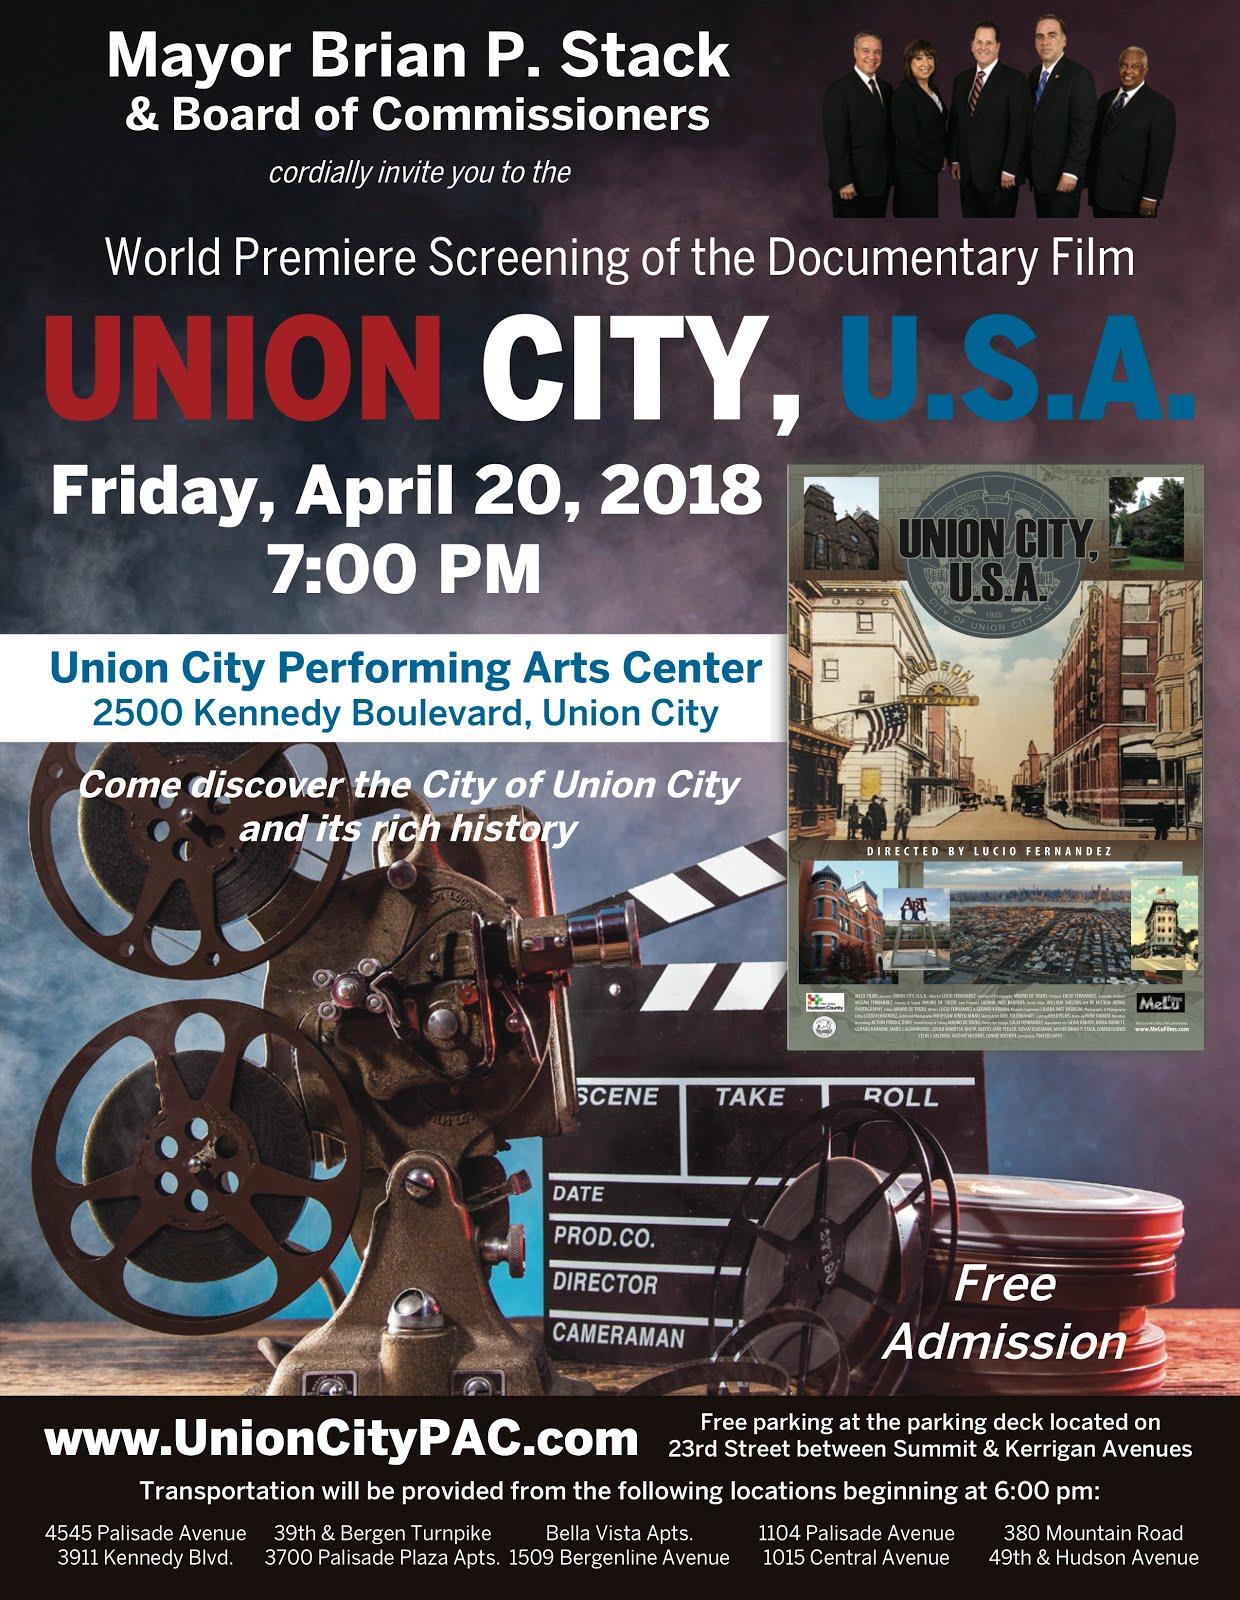 World Premiere Screening